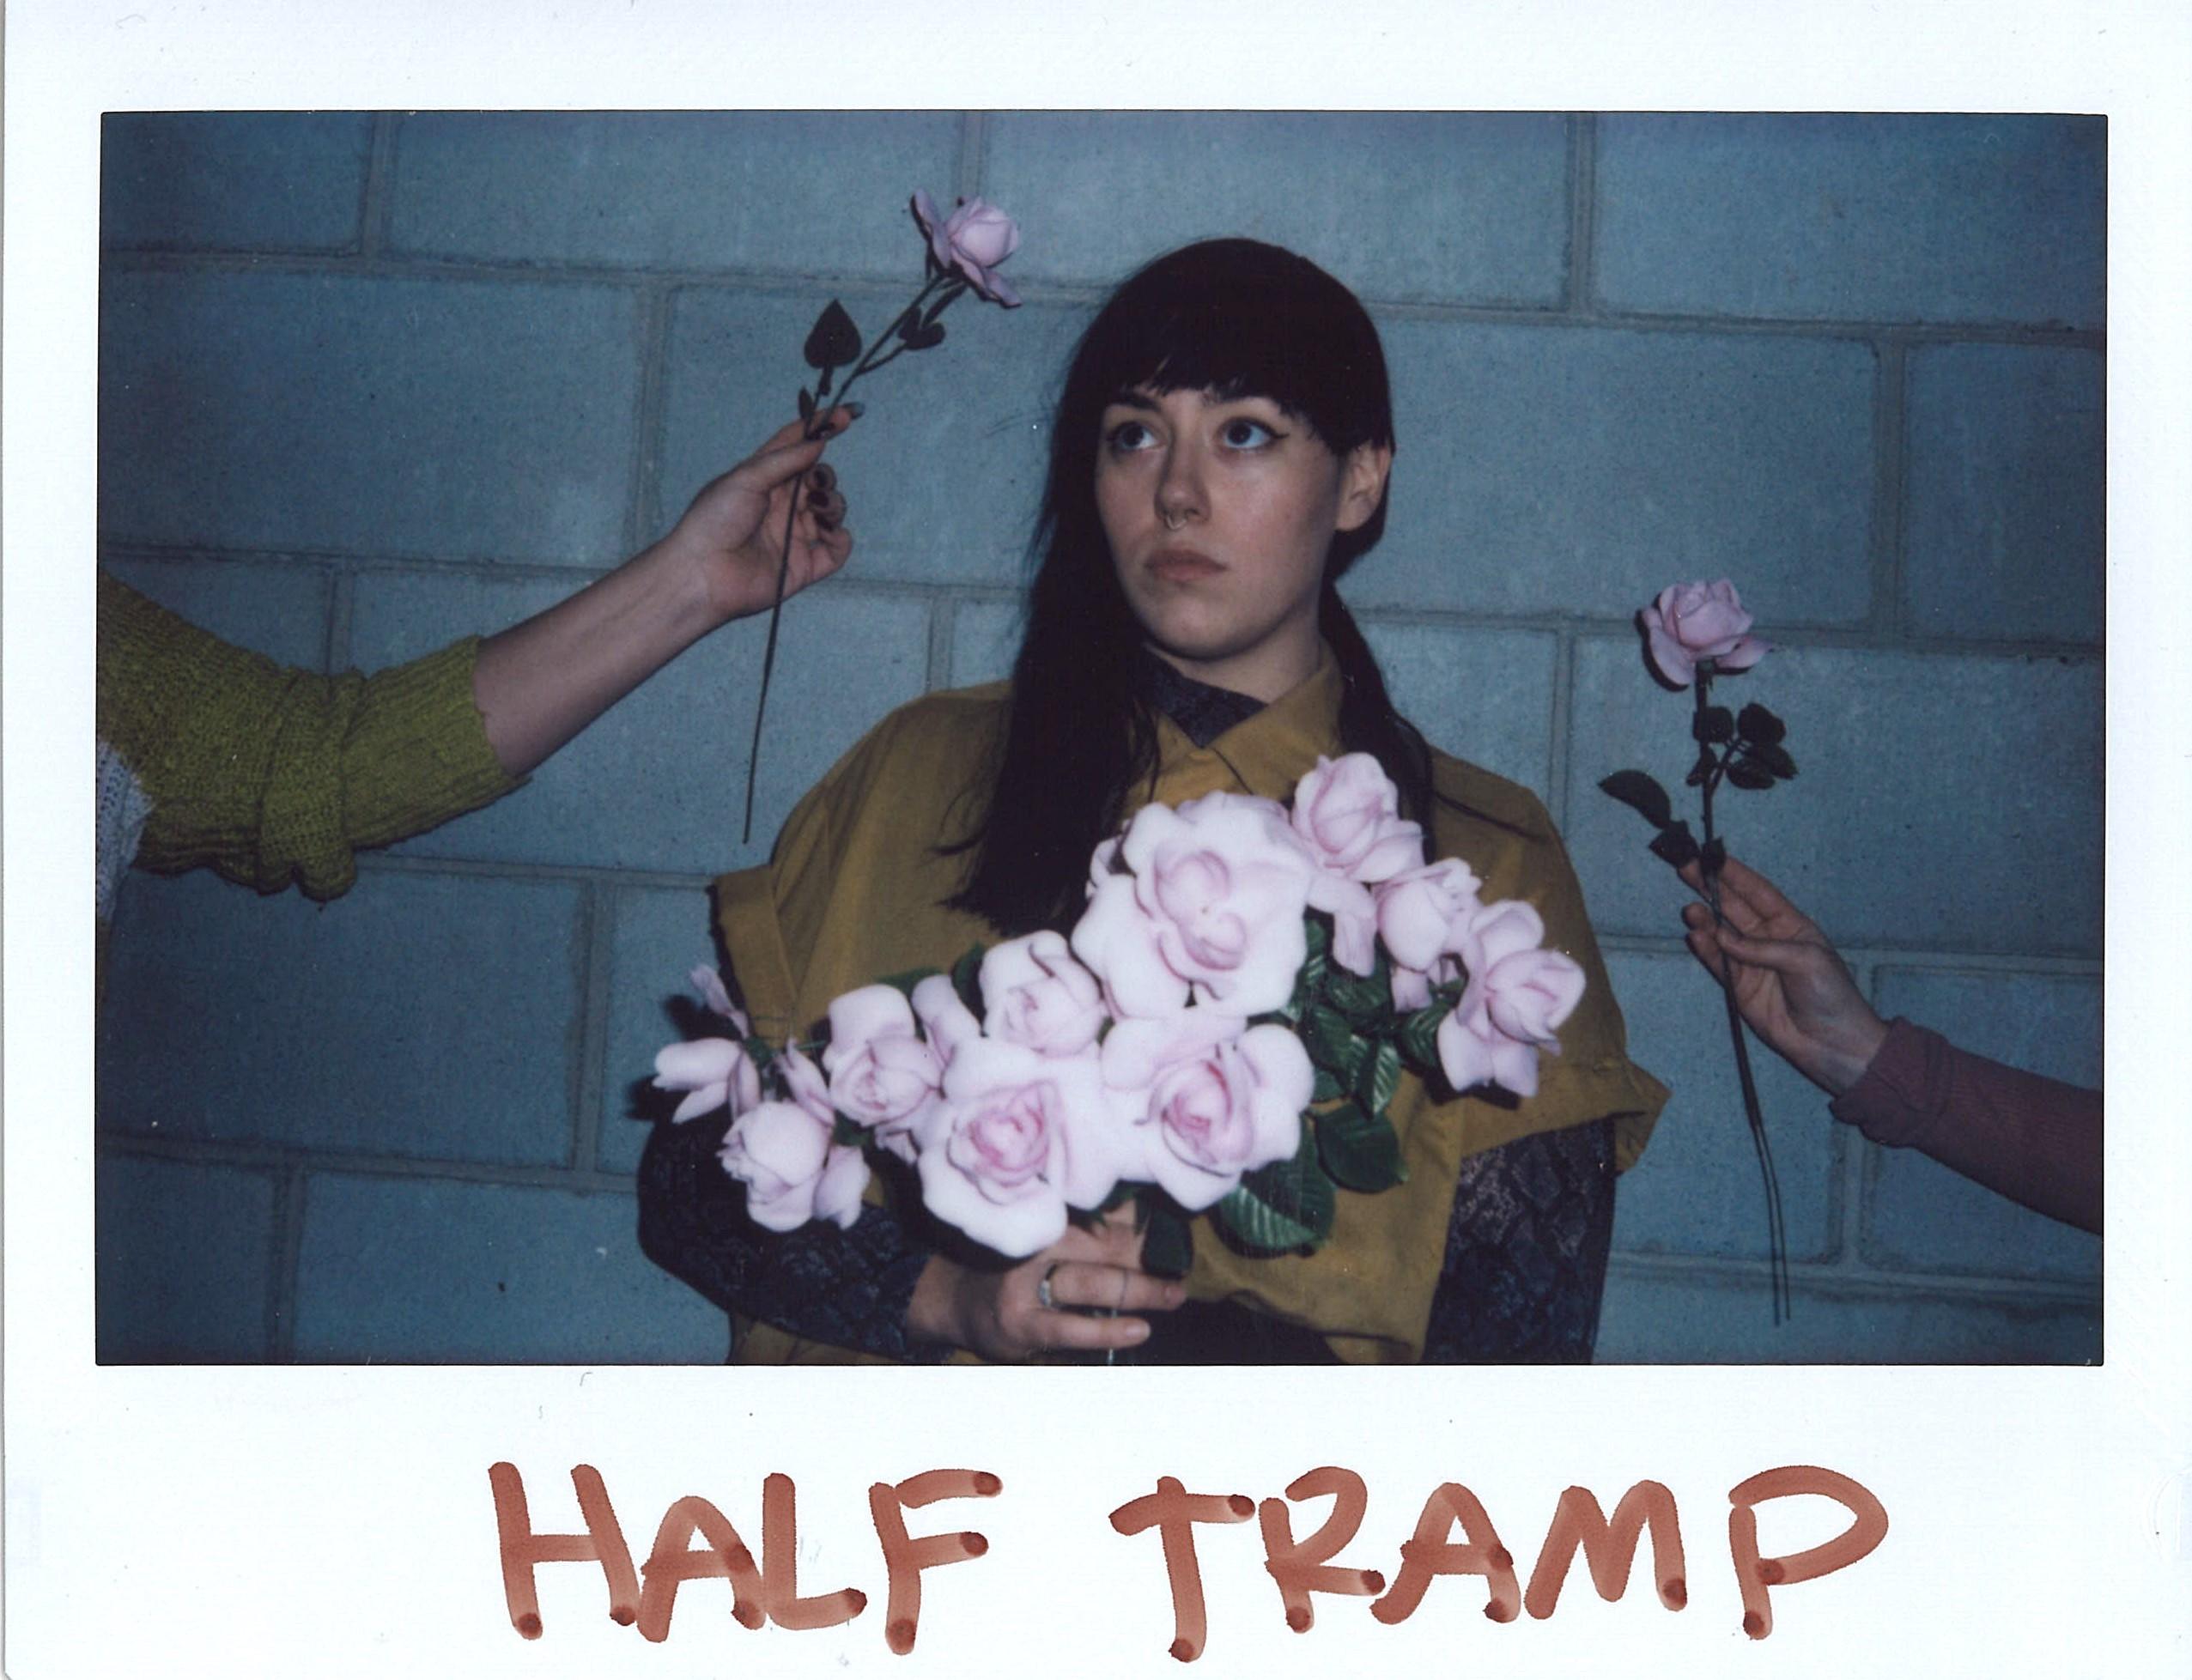 Half-Tramp